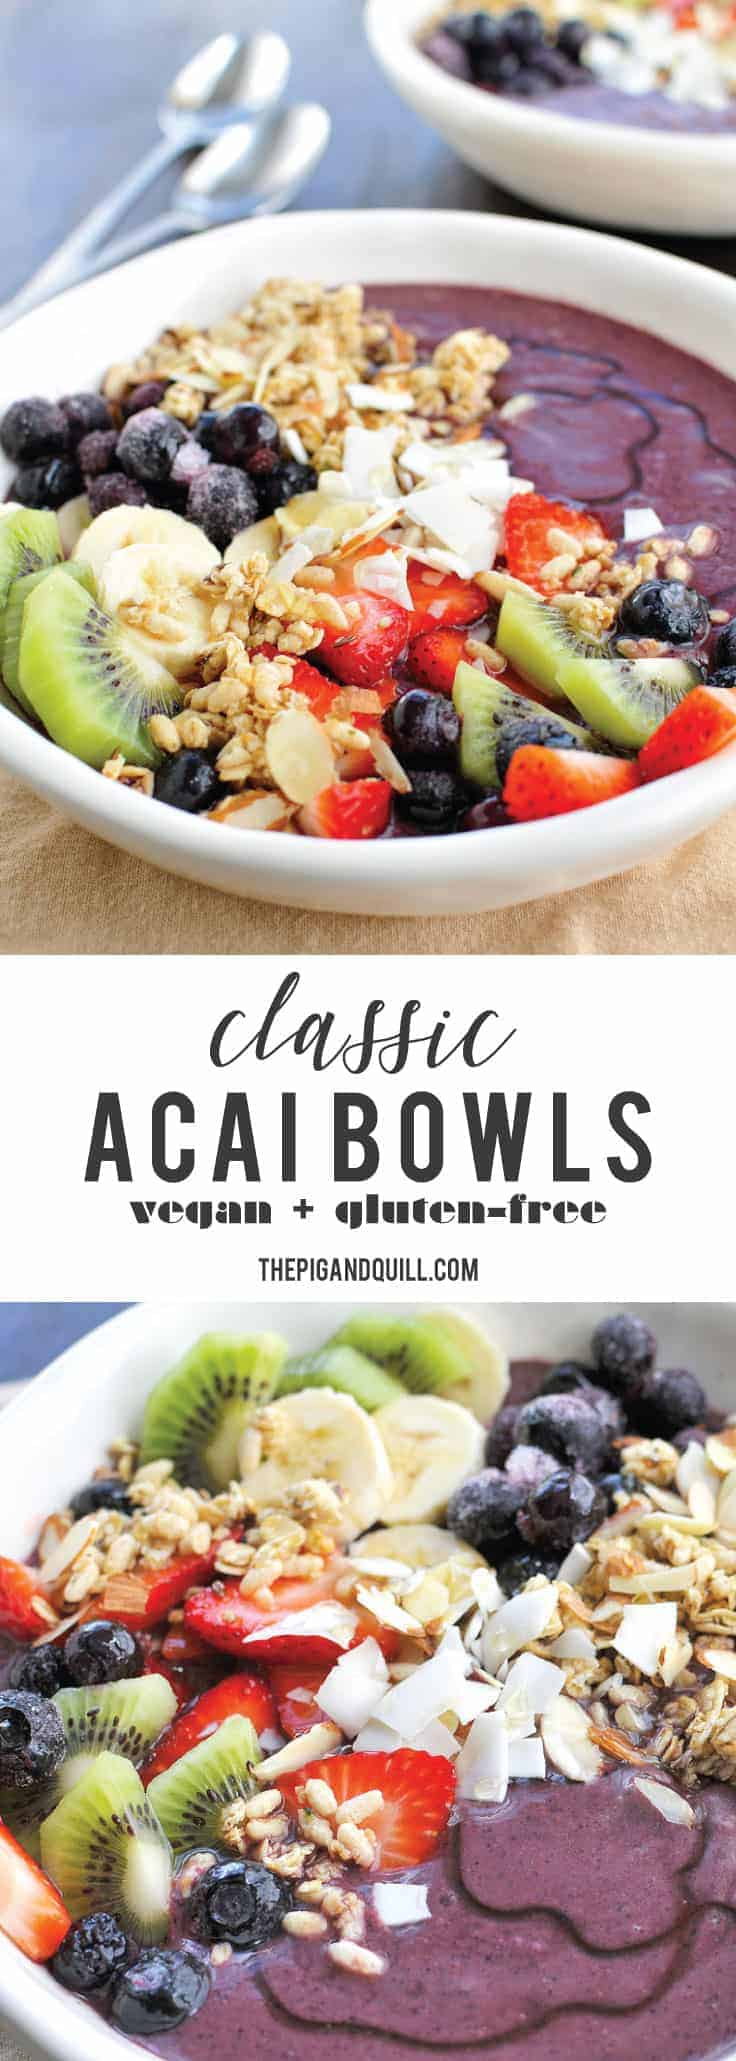 Classic Acai Bowls recipe (via thepigandquill.com) #vegan #glutenfree #breakfastbowl #healthy #plantbased